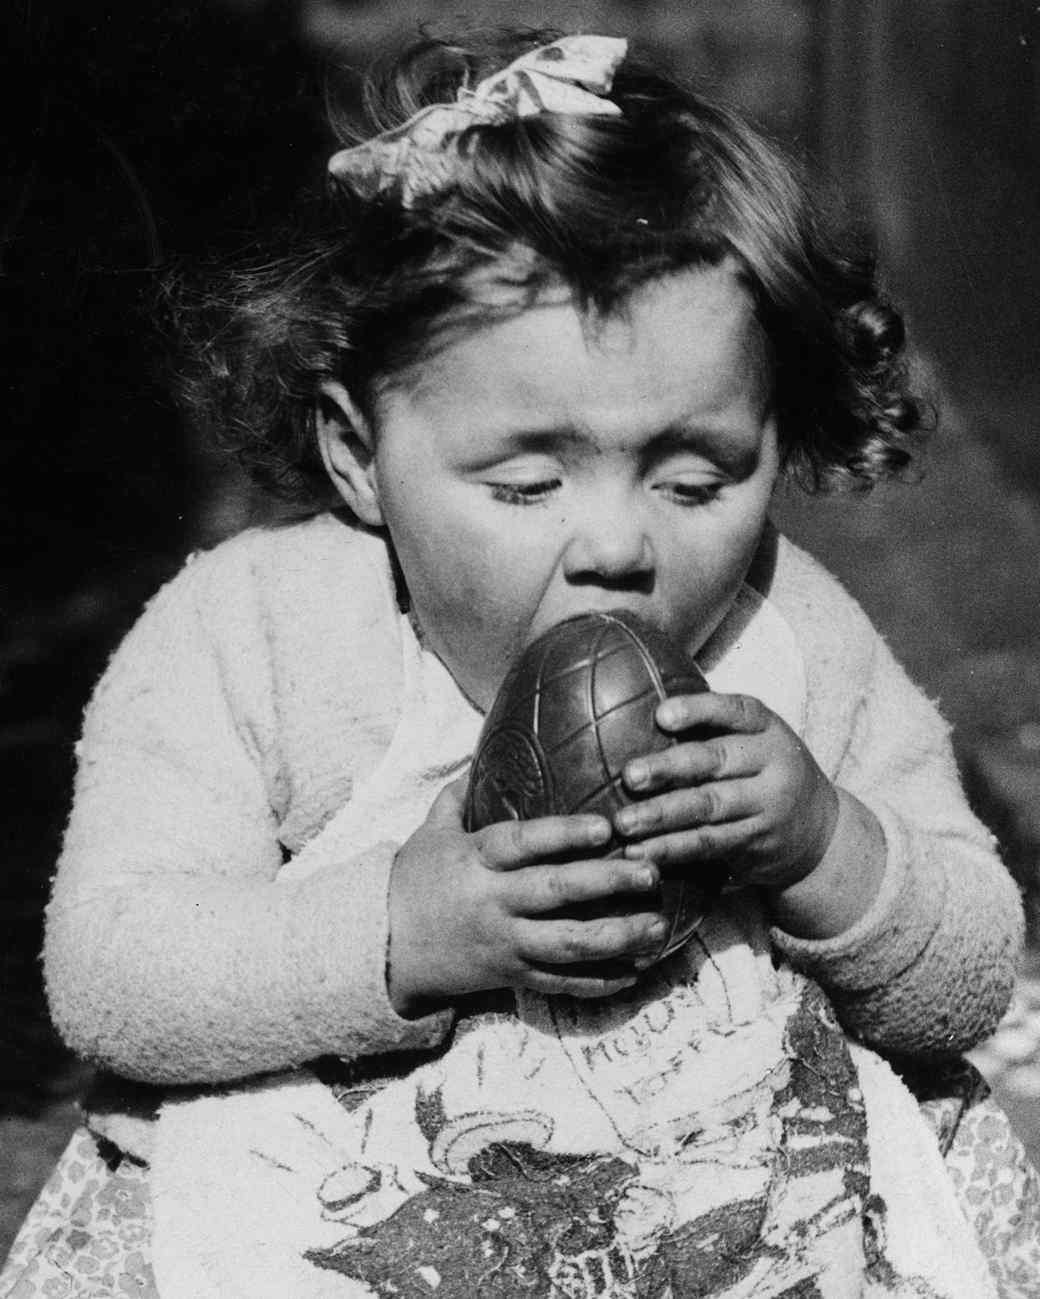 little girl biting into cadbury egg